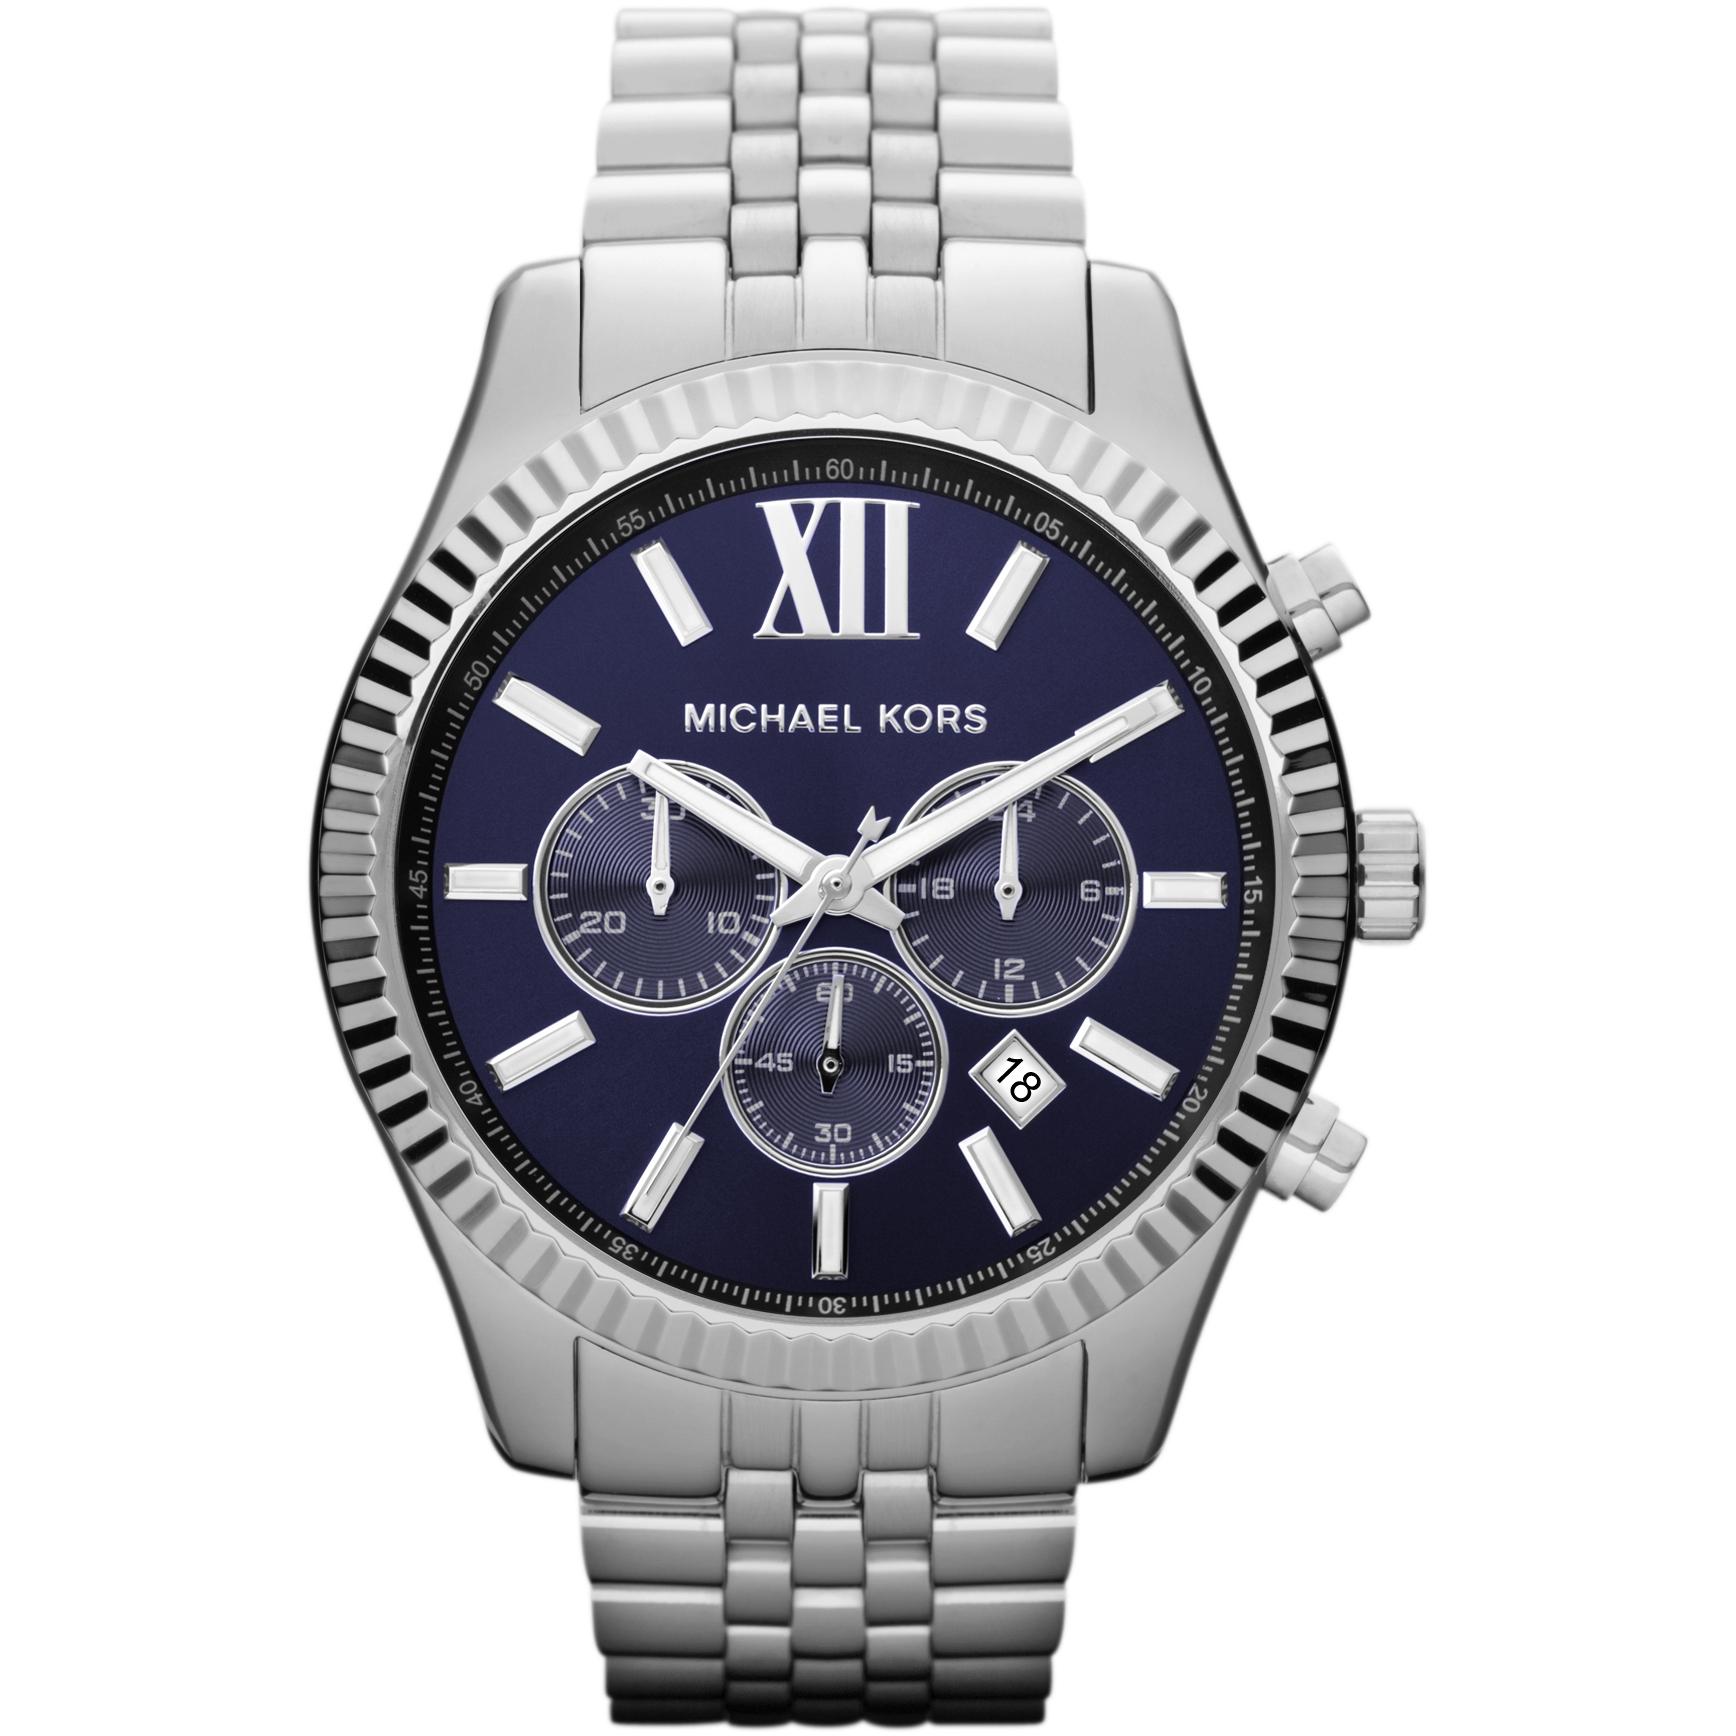 e1b8000fc0d0 Gents Michael Kors Lexington Chronograph Watch (MK8280)